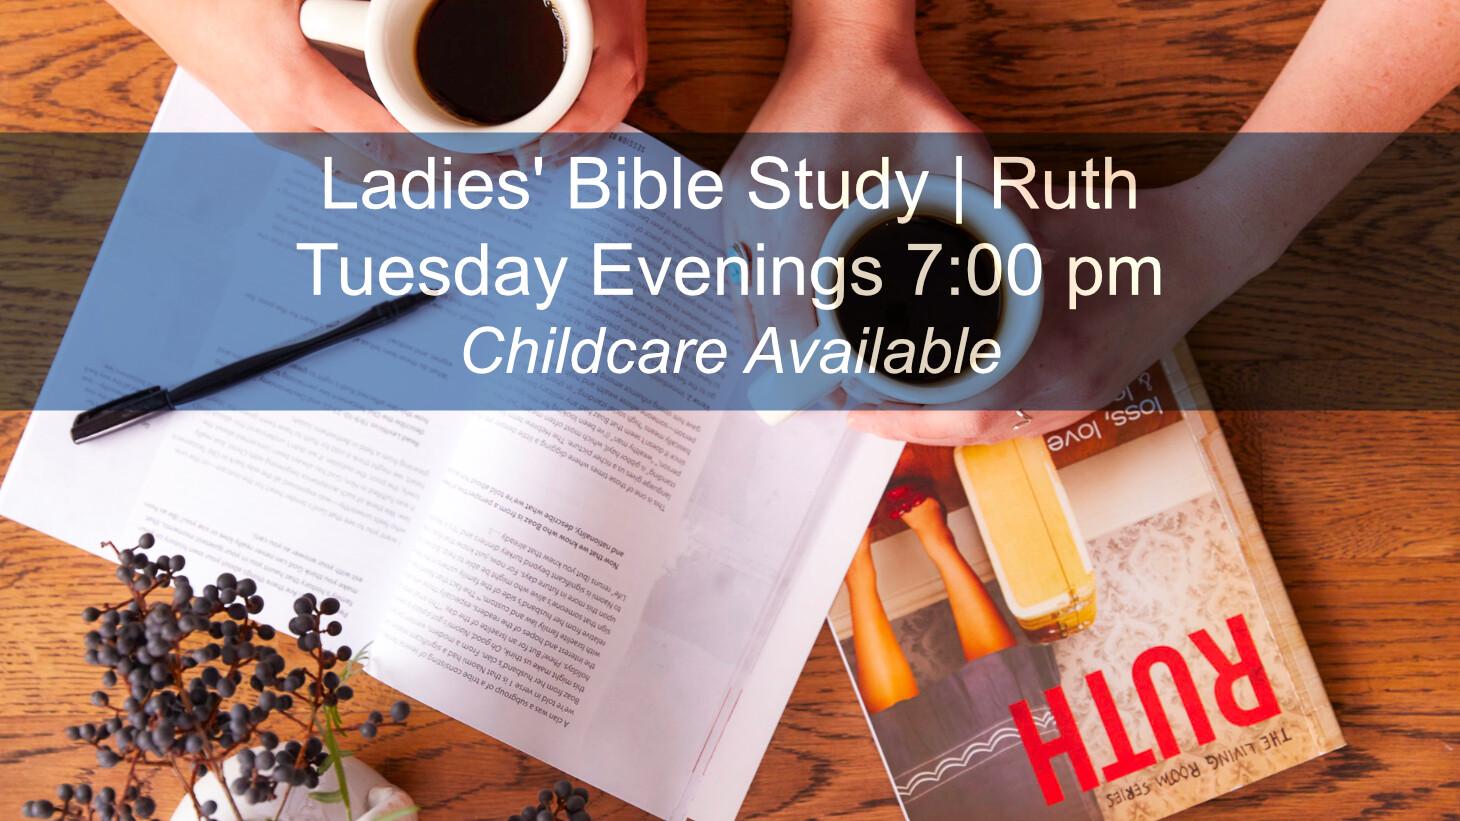 Ladies' Bible Study | Ruth